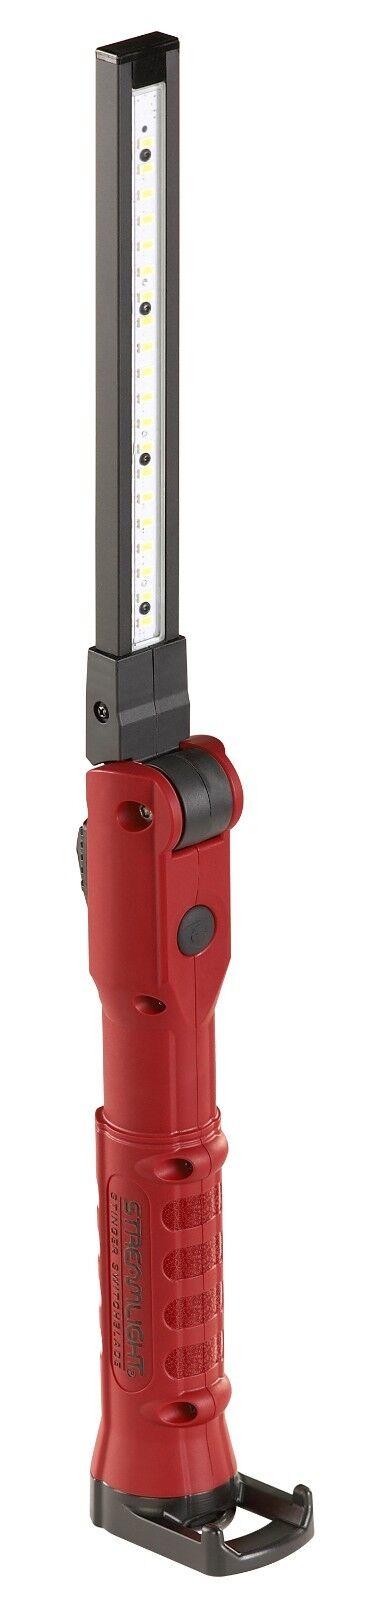 Streamlight 76800 Stinger Switchblade UV Rechargeable USB Zone lumineuse 800 Lm